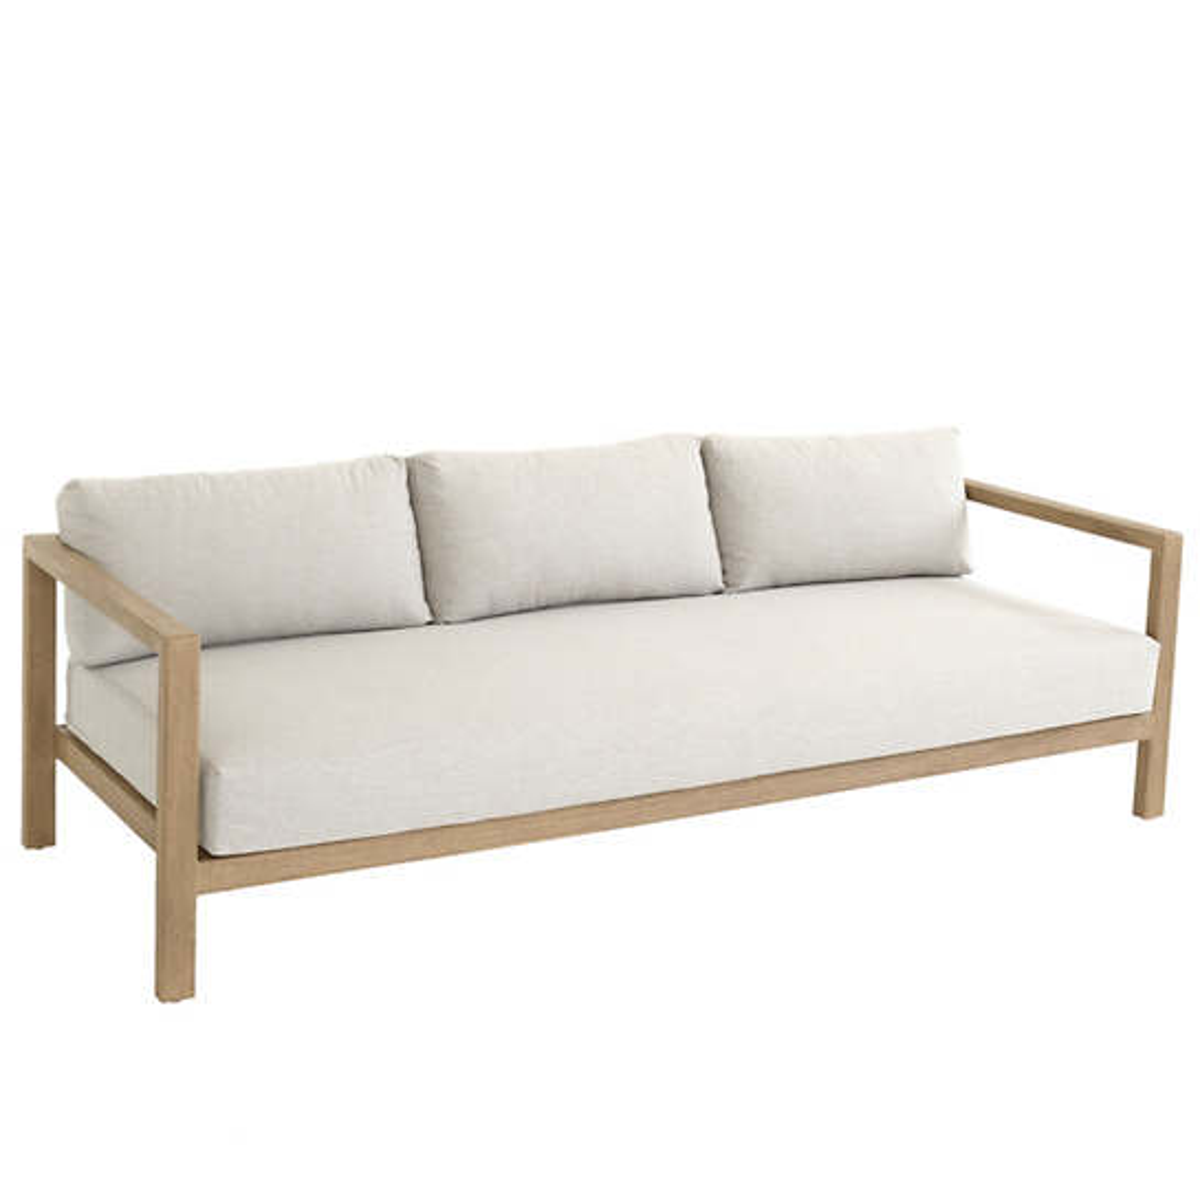 Malibu Outdoor Sofa